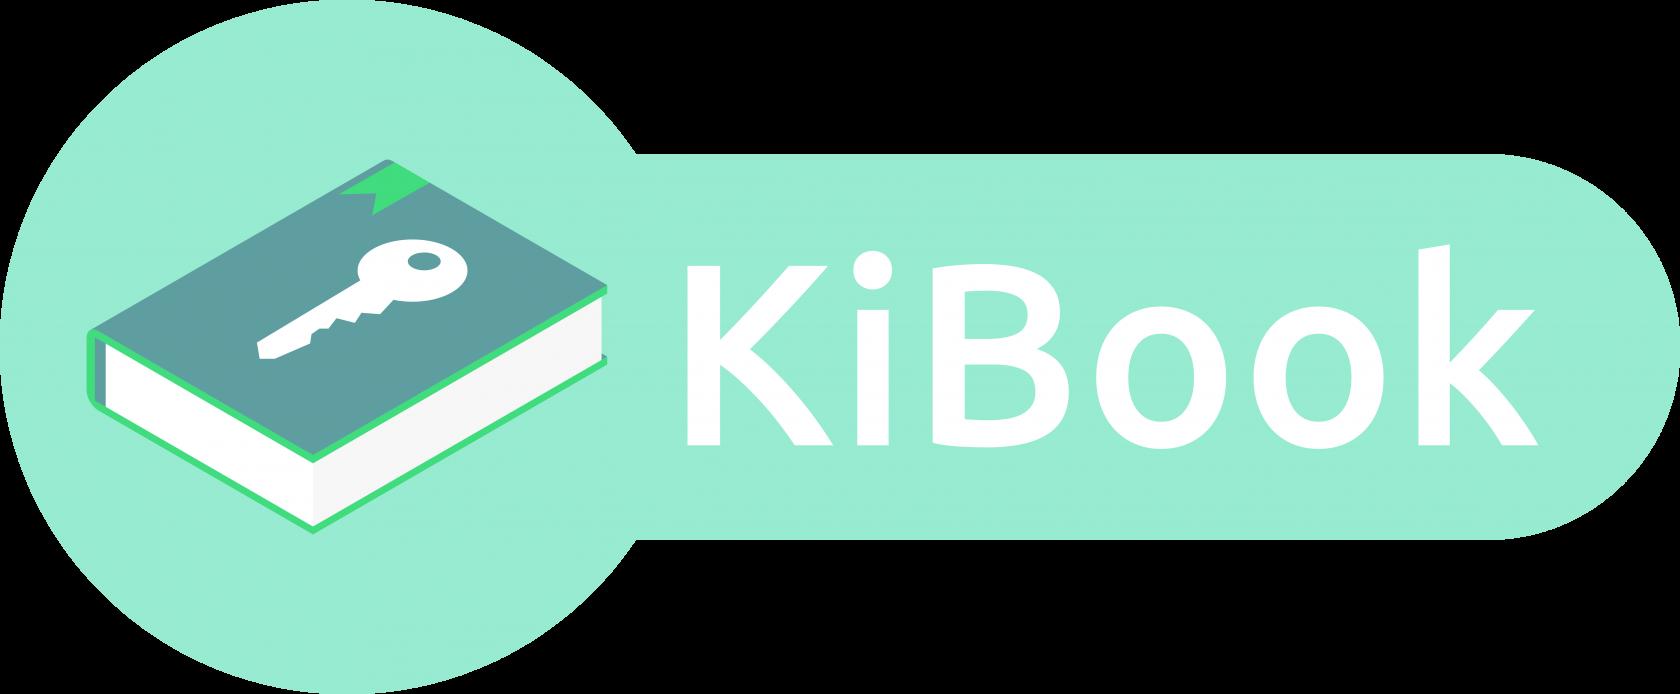 KiBookWebsiteLogo-(1).png